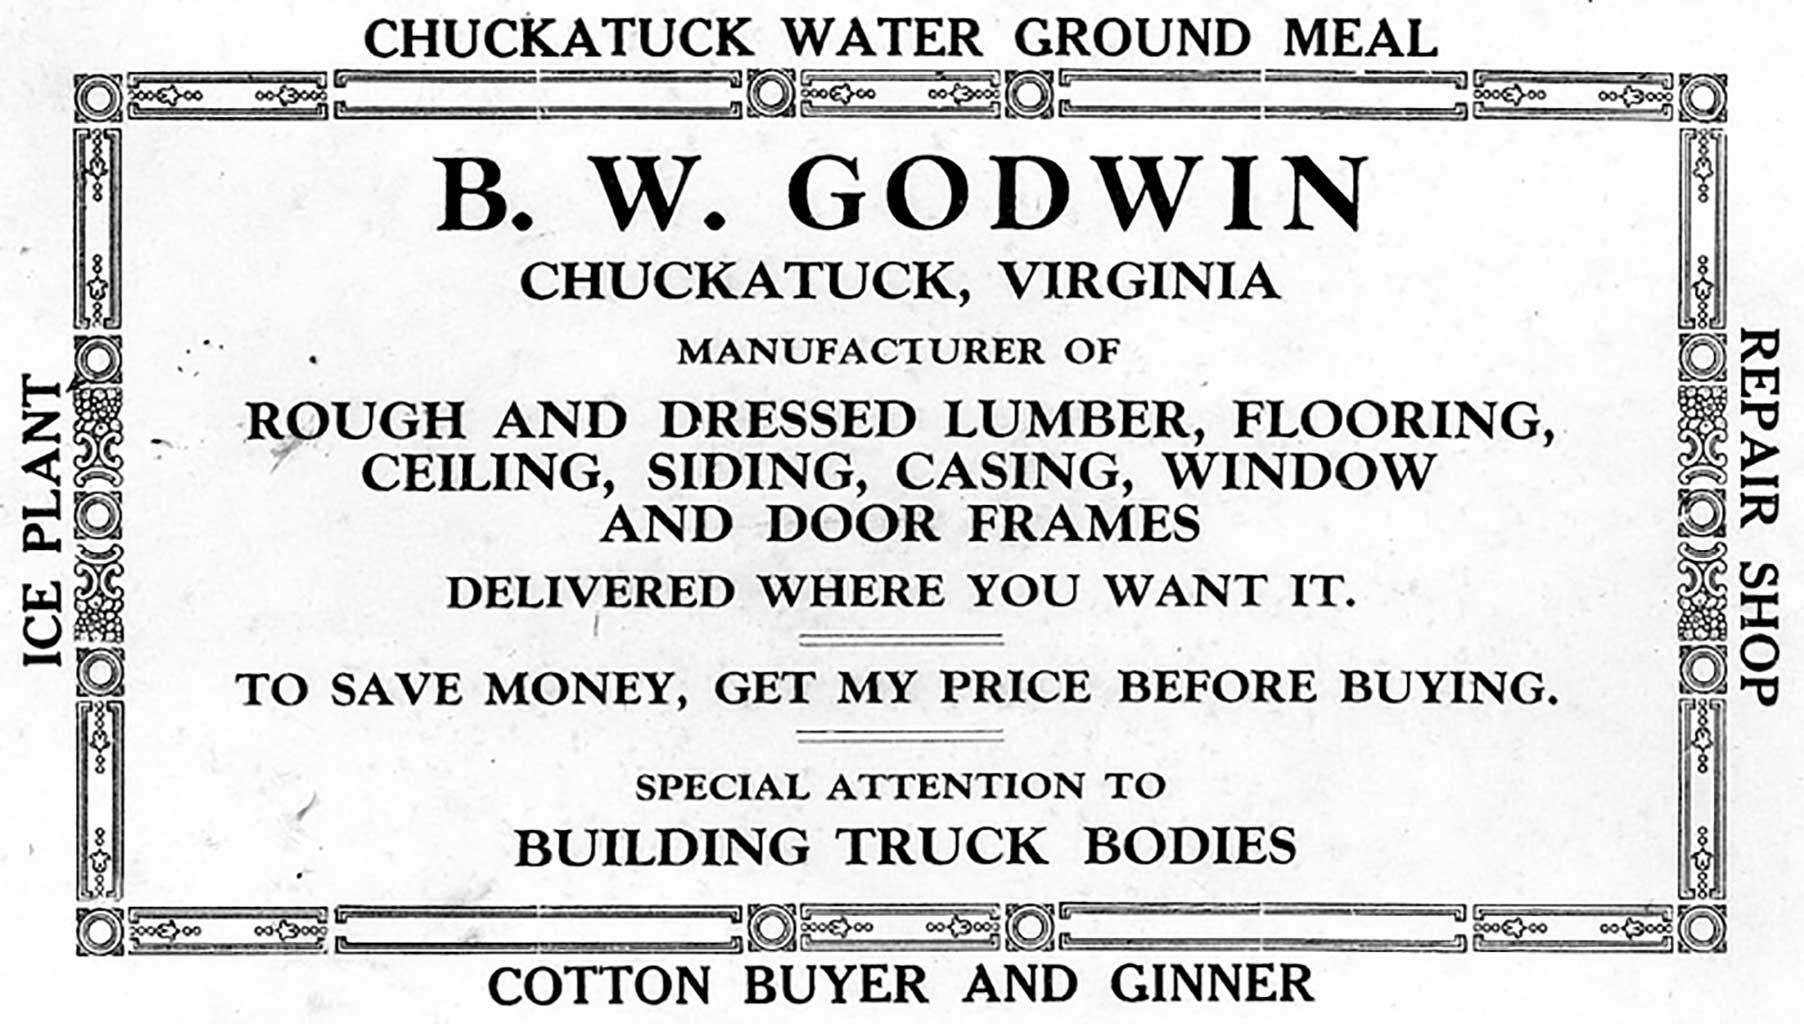 bw-godwin-blotter-ice-planr-grist-mill-lumber-co-img112